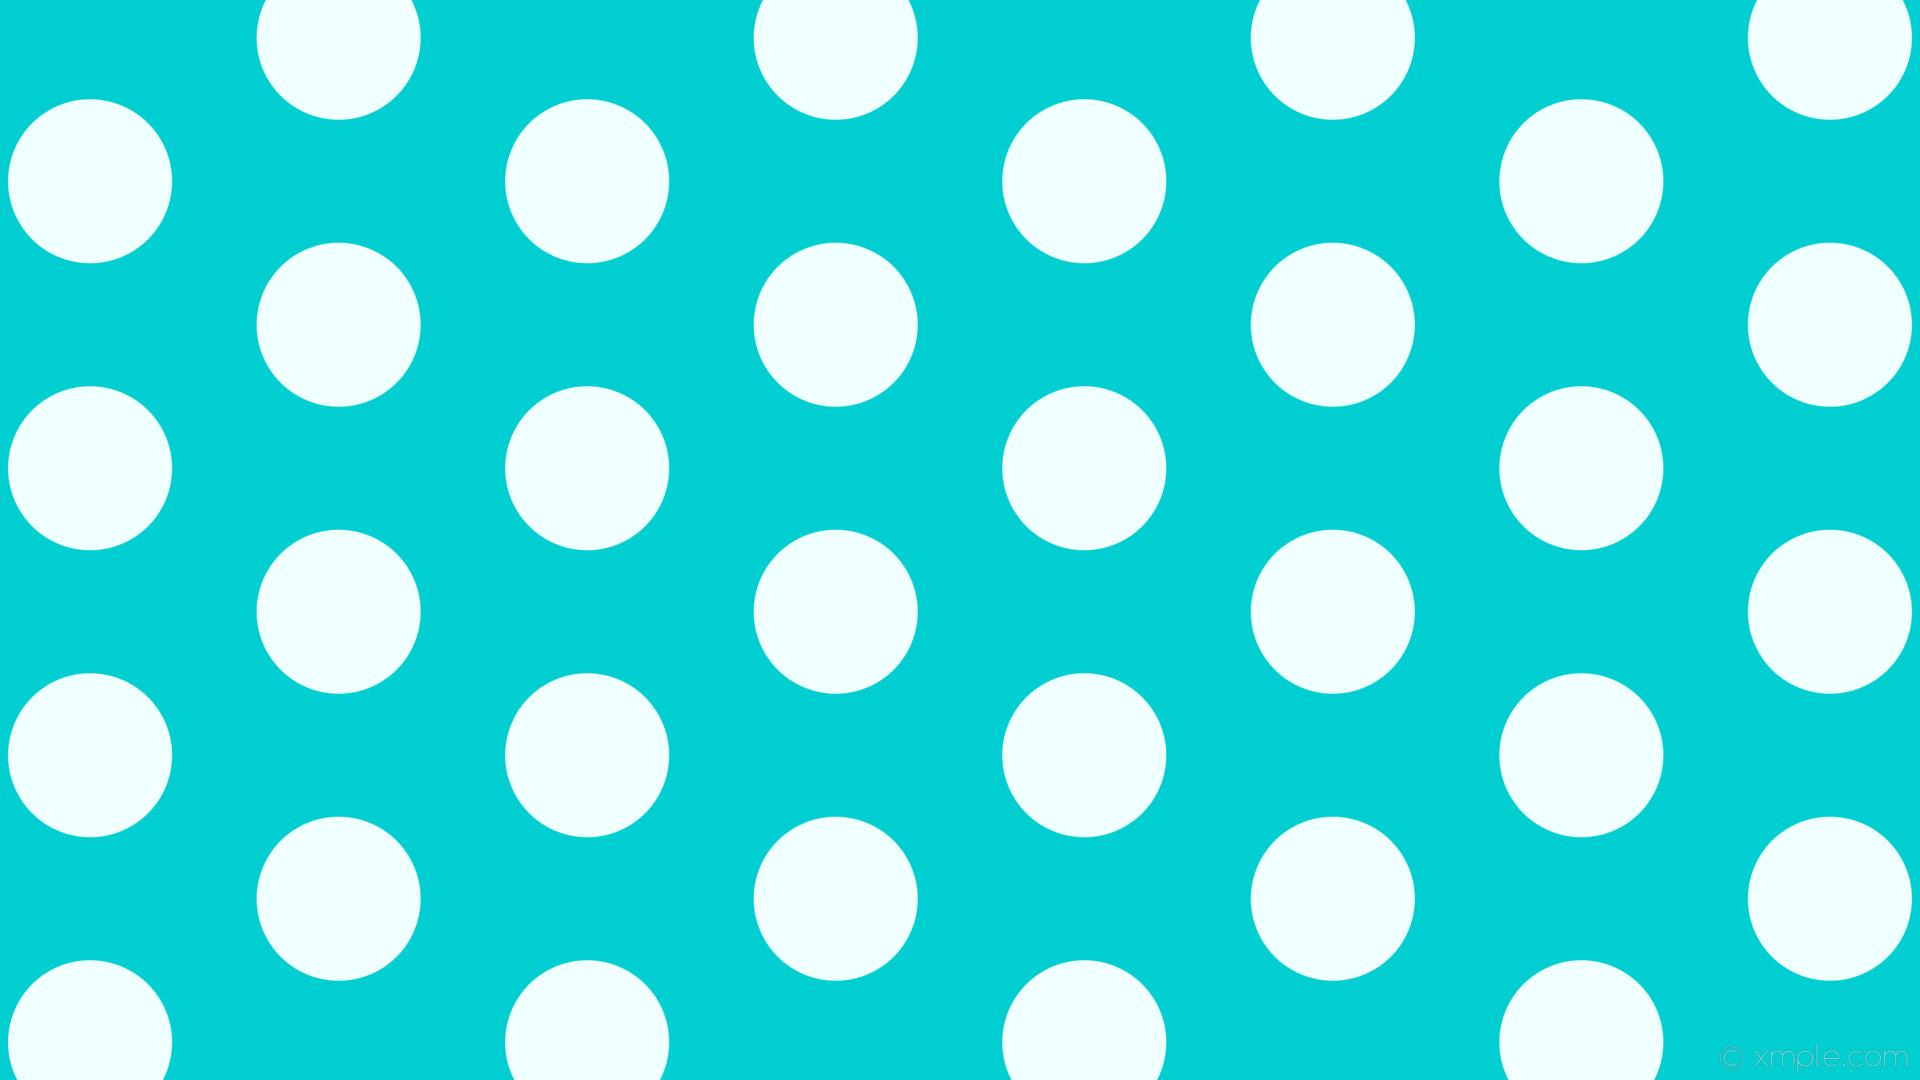 2560x1600 Red Polka Dot Wallpaper